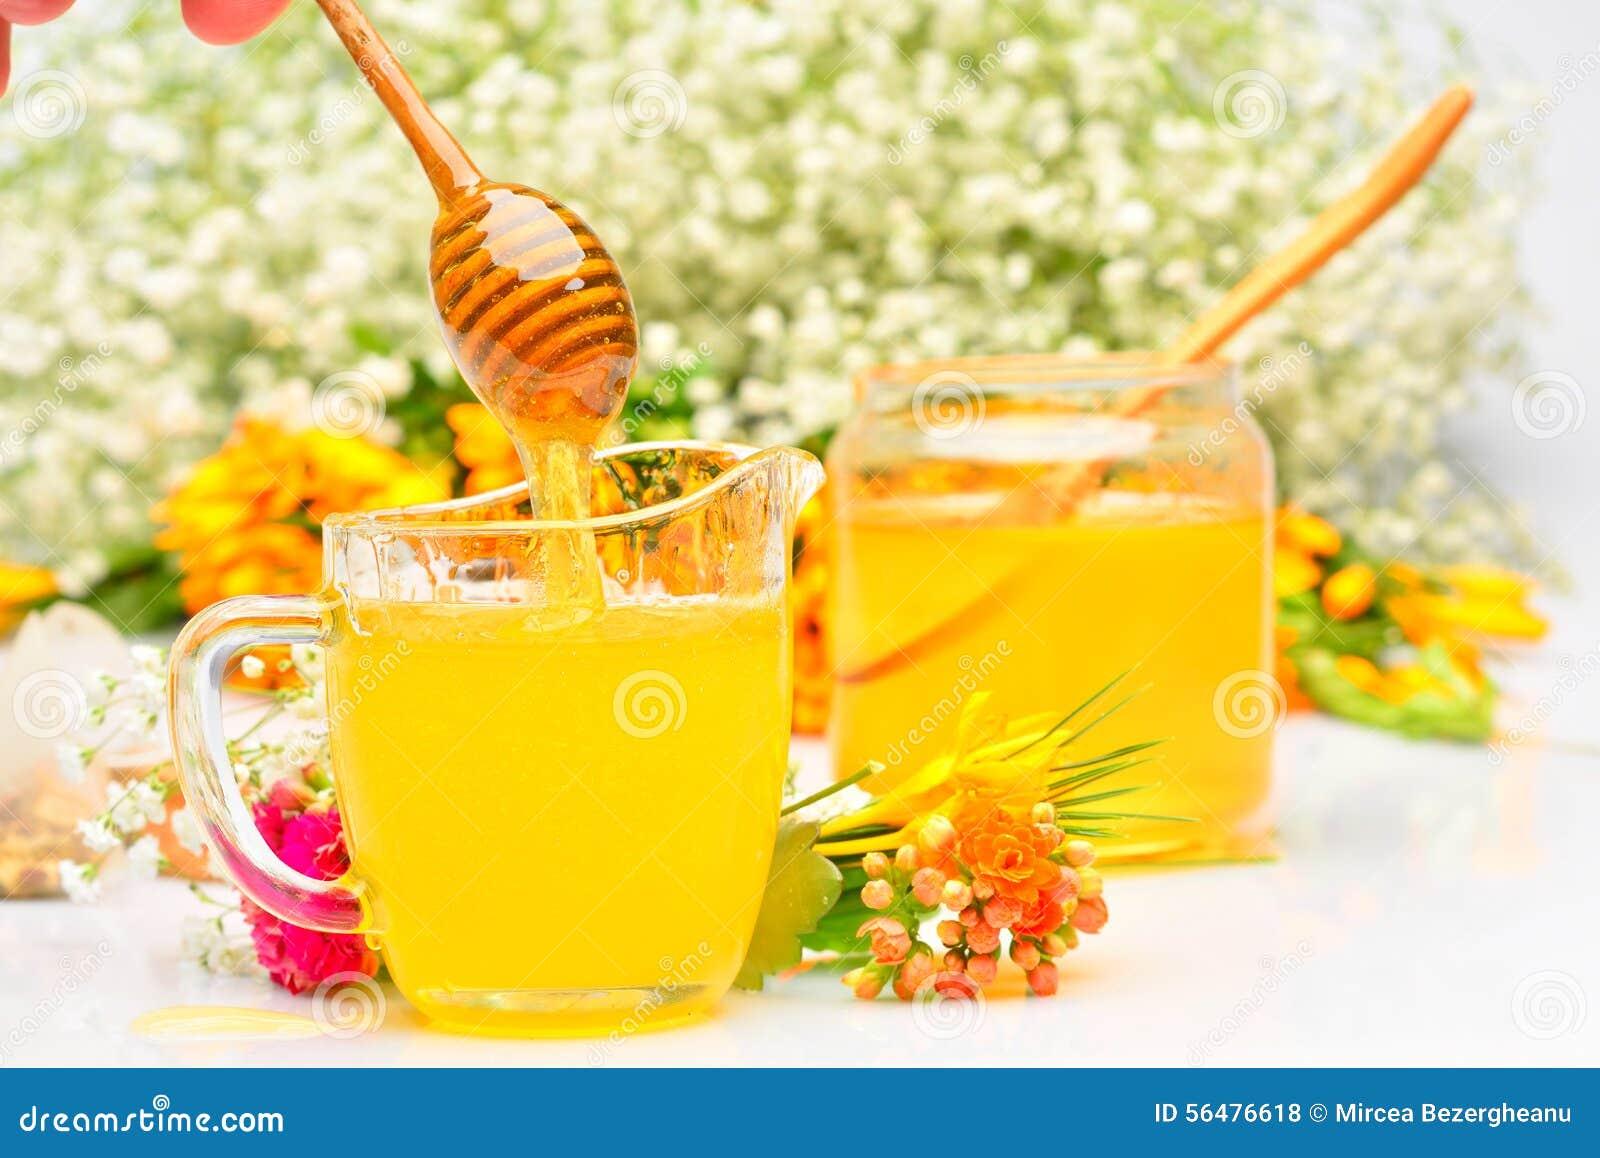 Miel d or versant du bâton en bois